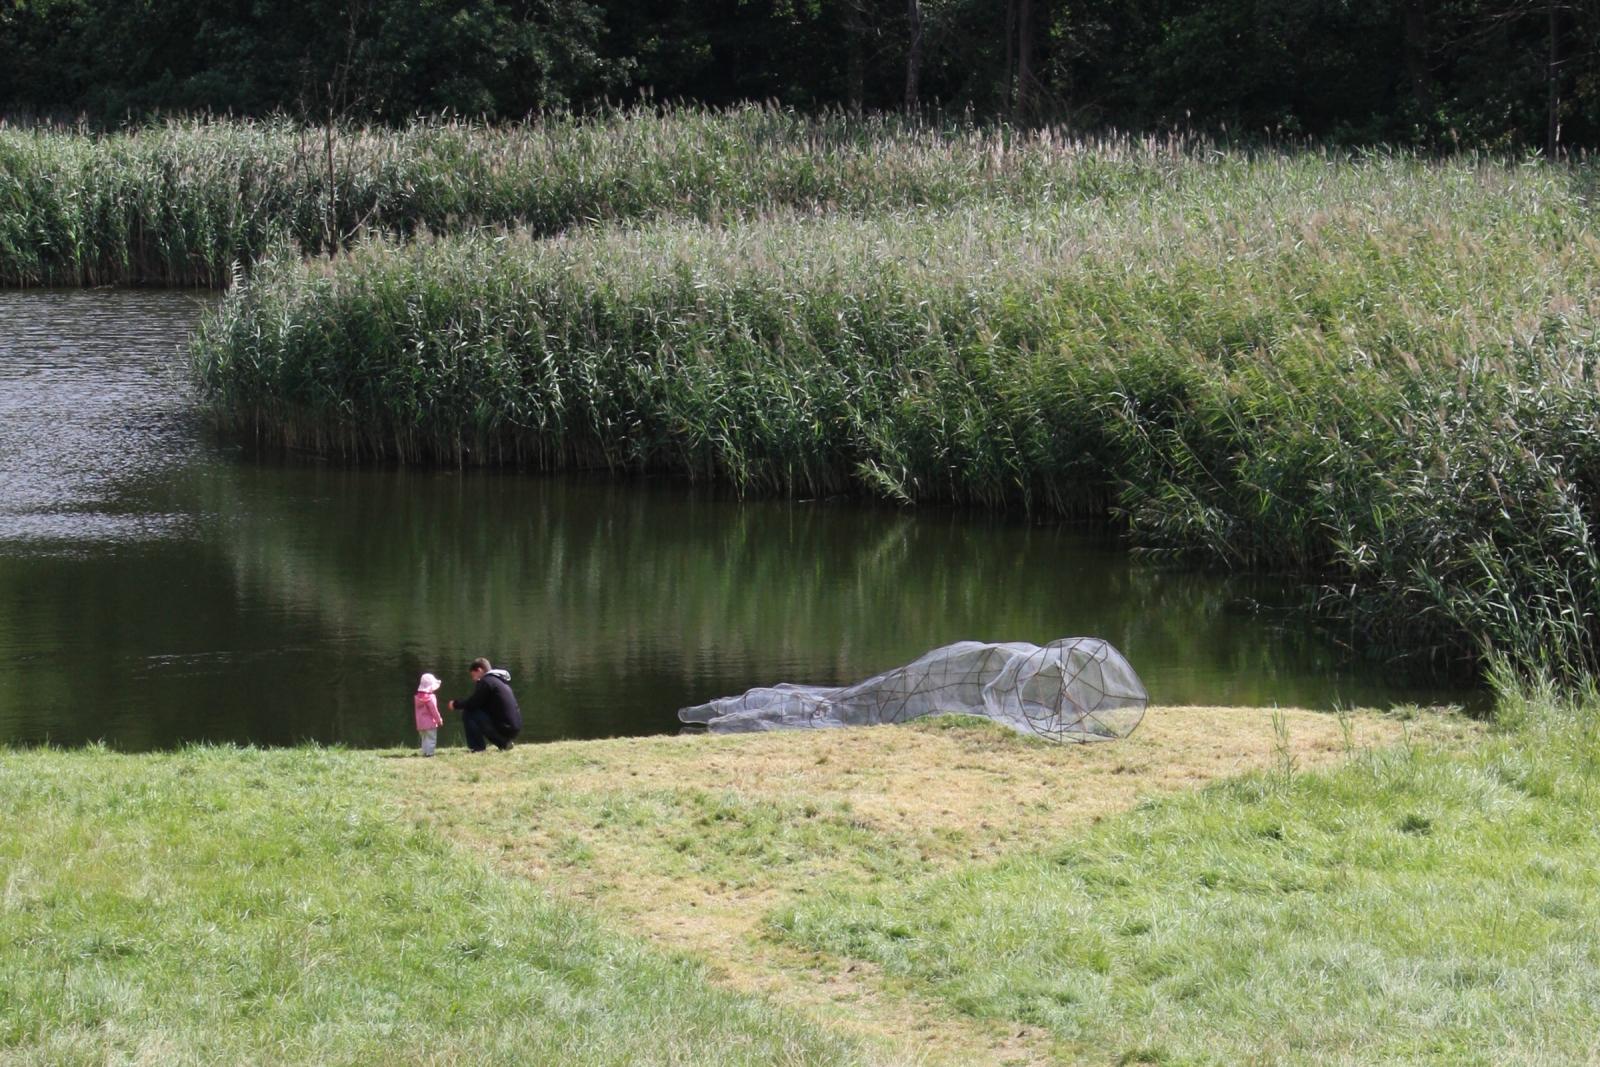 Testing the Waters, Sculpture, Steel and Hexagonal Wire Mesh, 2014, Schloss Trebnitz, Germany. Photo (c) Joseph Marr.